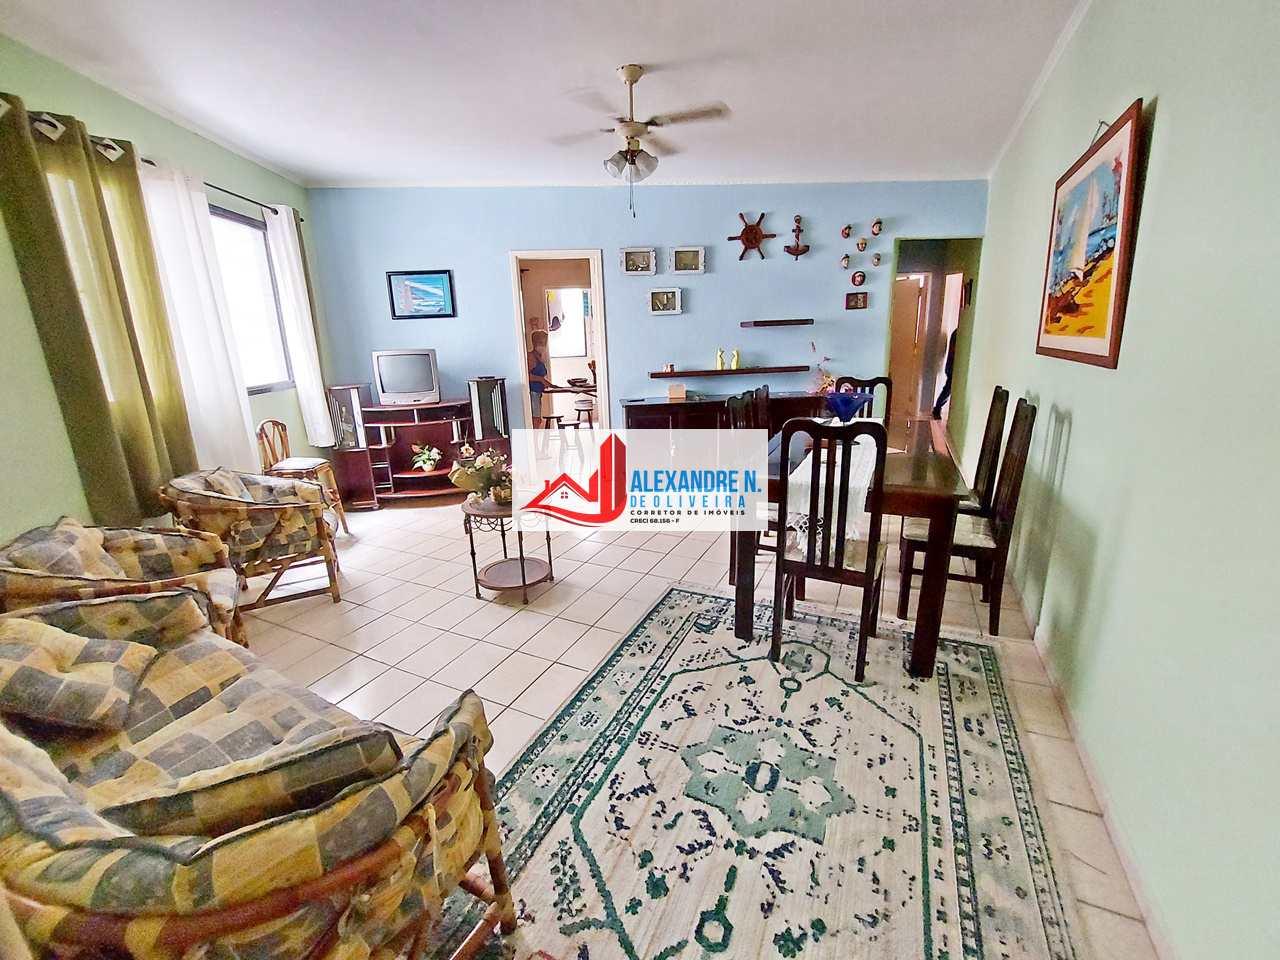 Apartamento 2 dorms, Ocian, Praia Grande, R$ 240 mil, AP00779